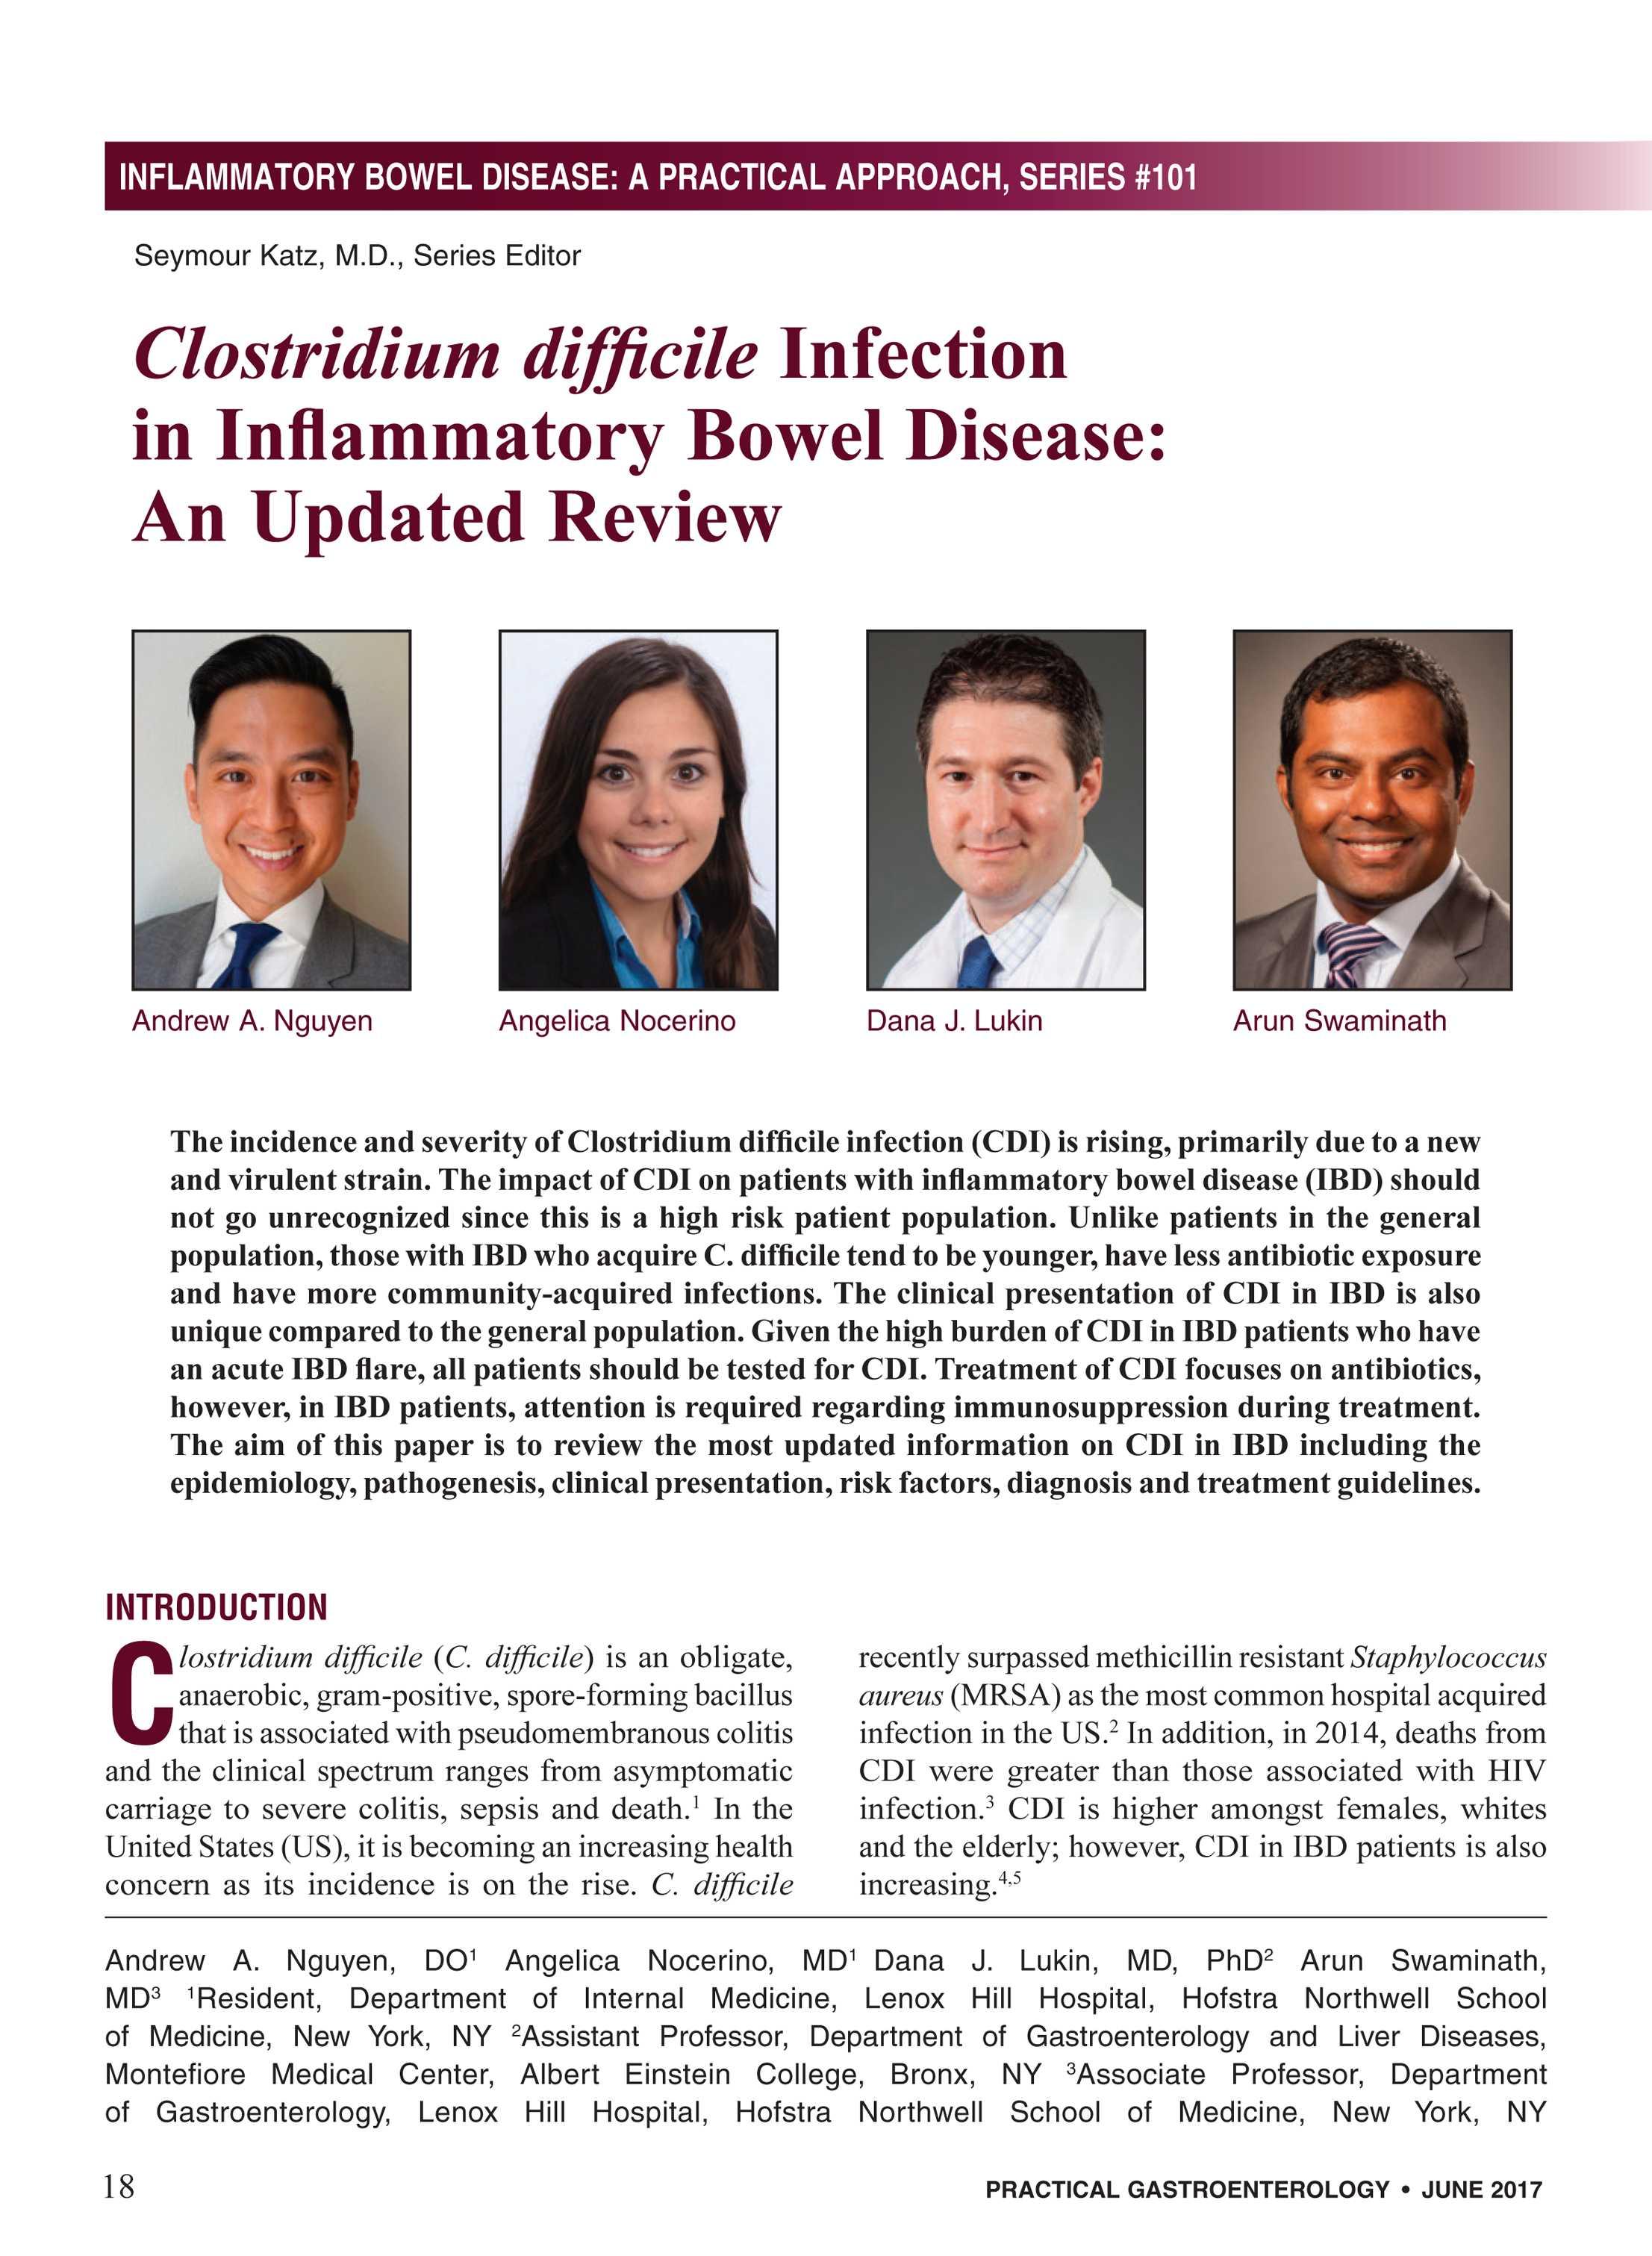 Practical Gastroenterology - June 2017 - page 18